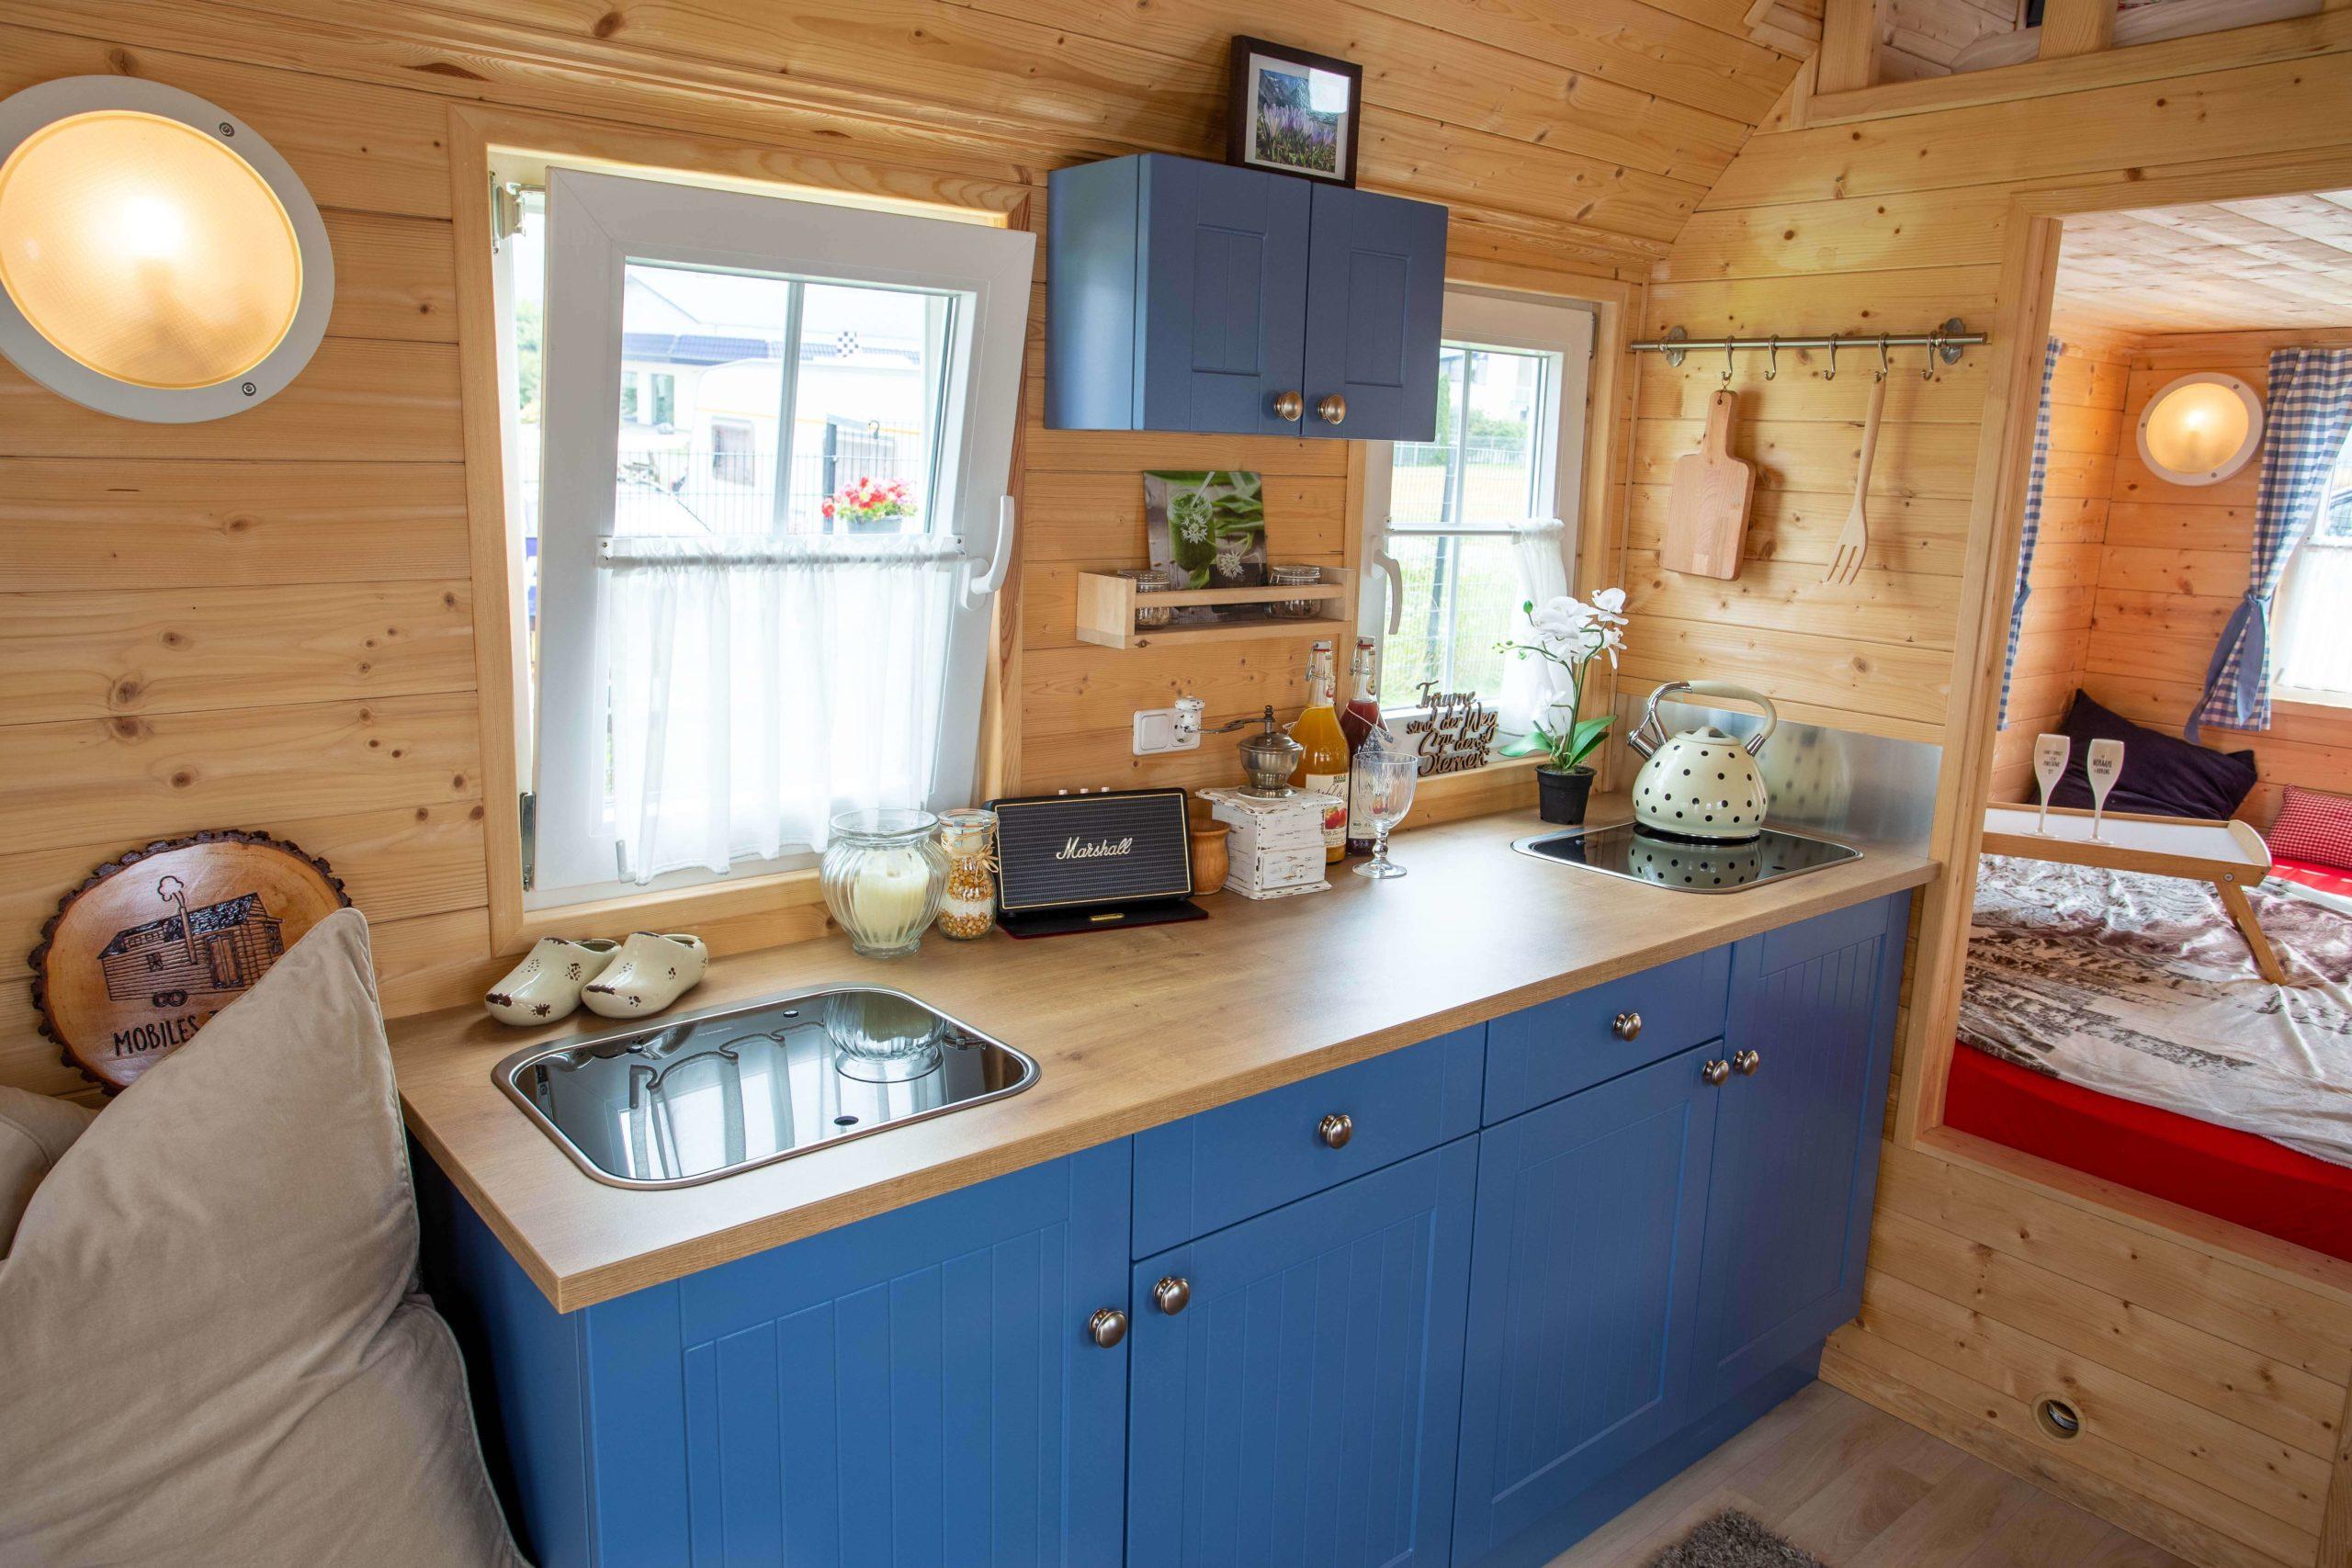 mobiles-tiny-house-island-vital-camp-gmbh-13